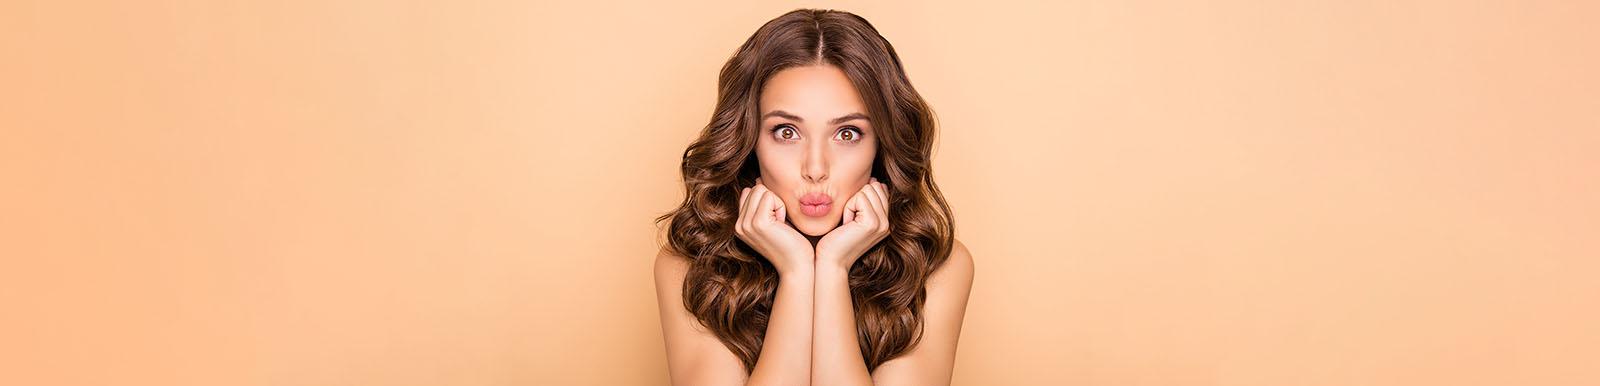 Female sending kiss pout lips over beige pastel color background